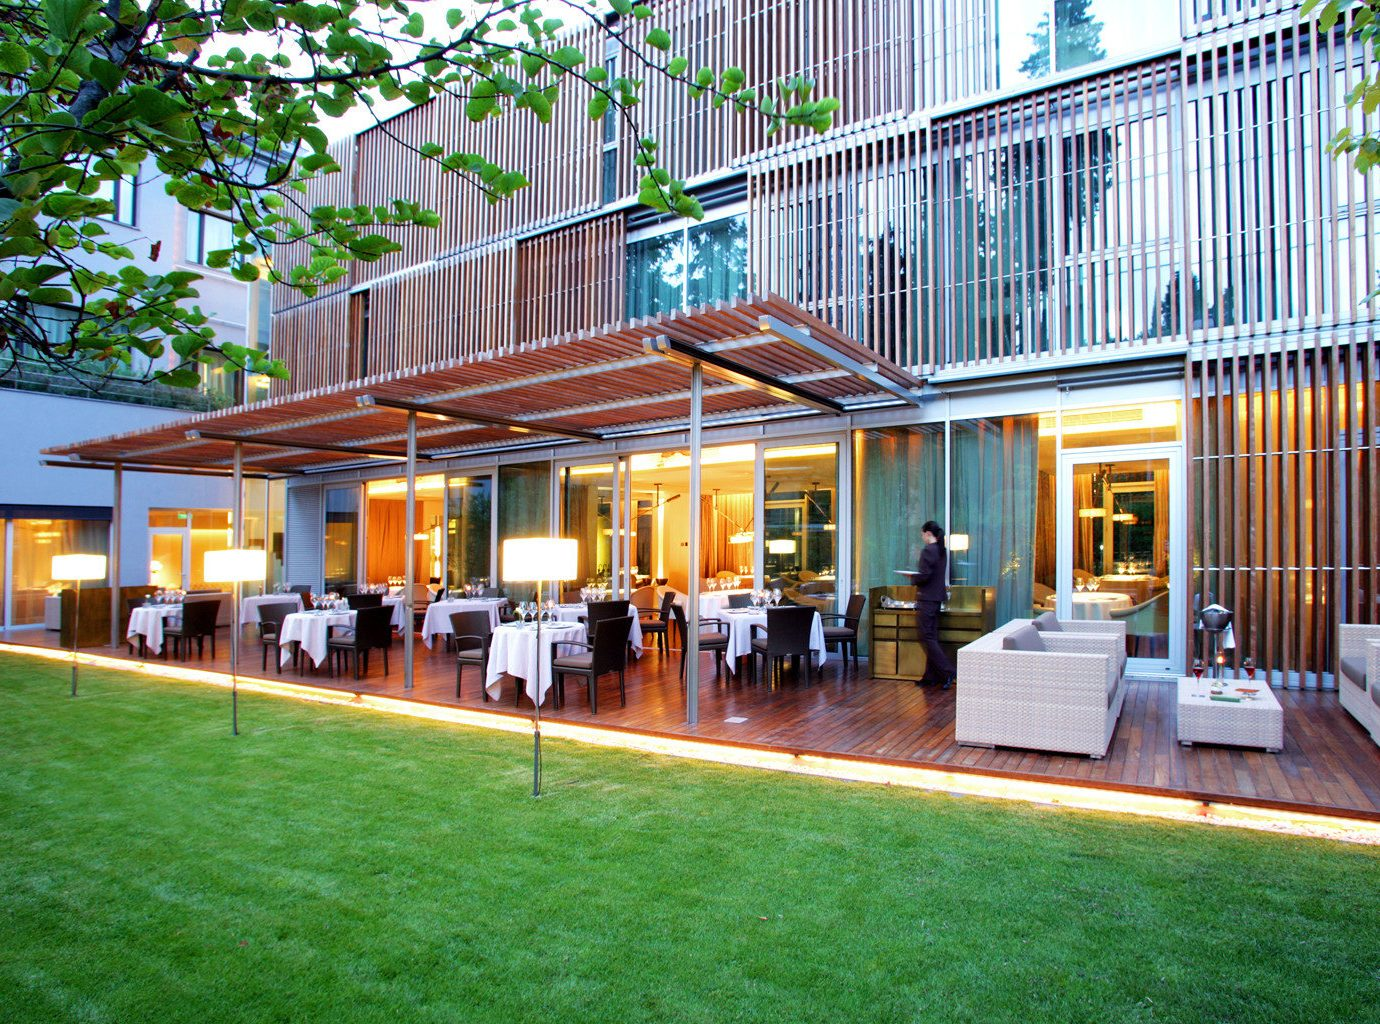 Bar Boutique Hotels Dining Drink Eat Hotels Lounge Modern grass outdoor leisure property building house home condominium estate neighbourhood residential area real estate Resort facade park Courtyard